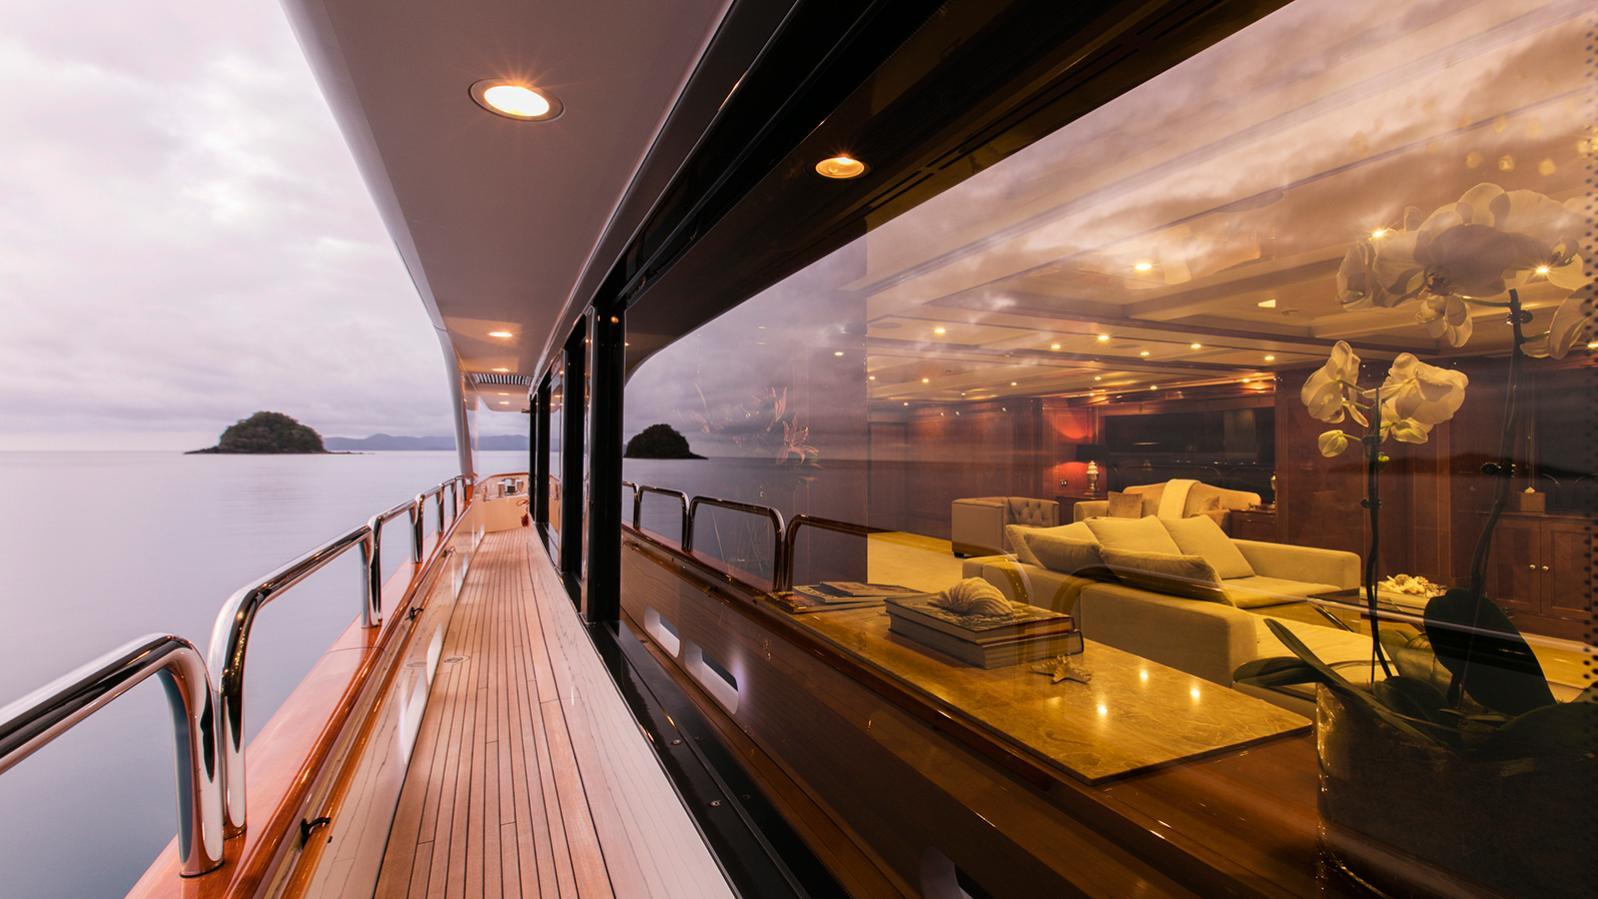 sovereign-motor-yacht-benetti-2002-44m-side-deck